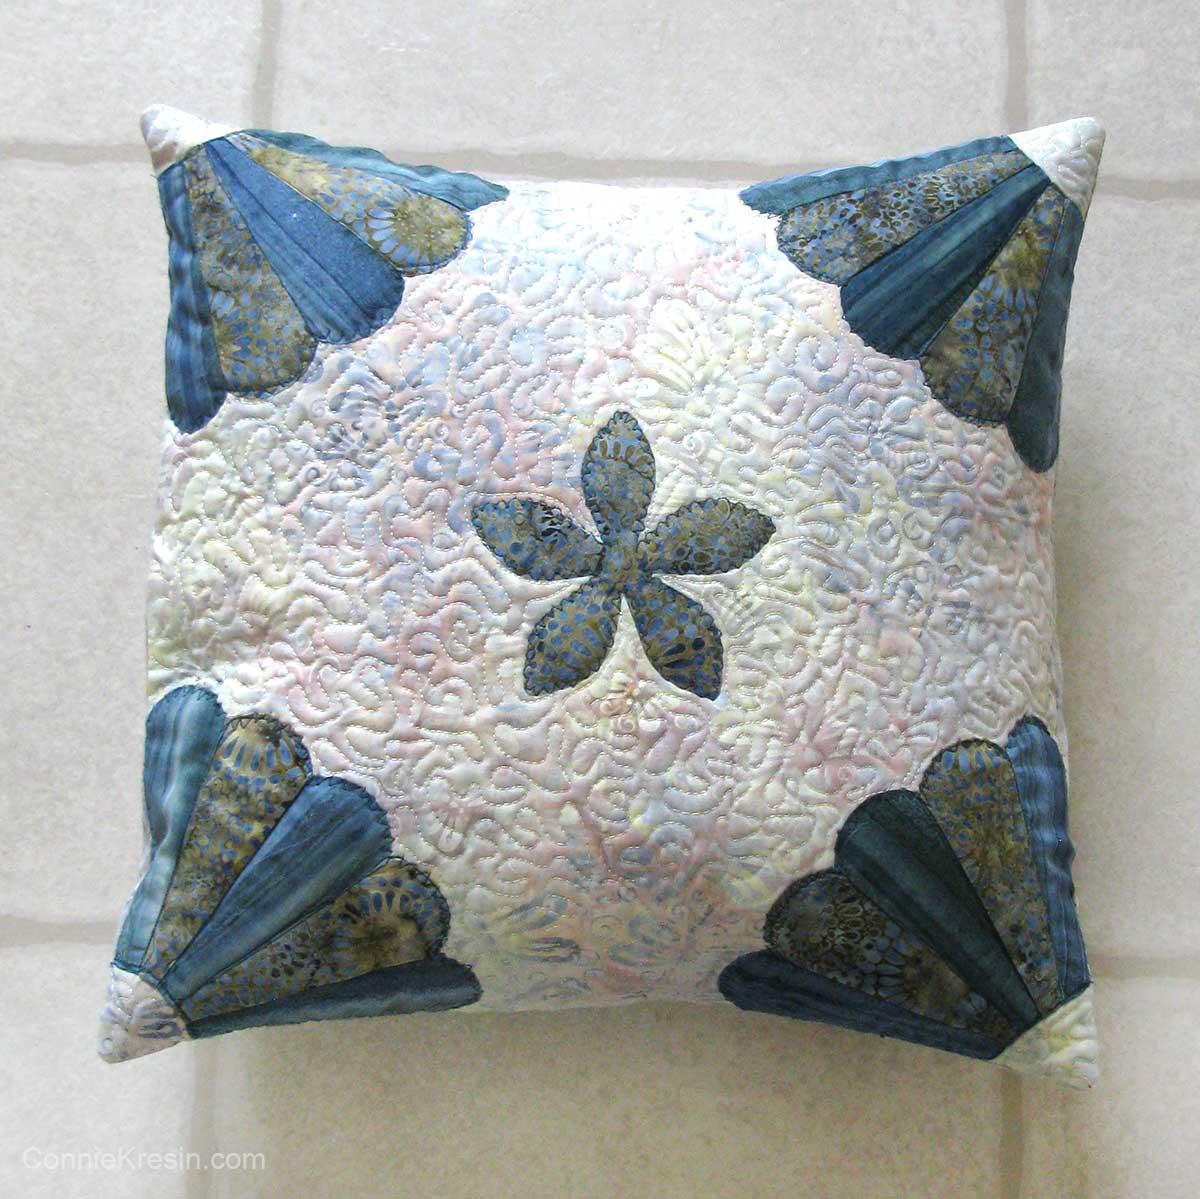 Dresden applique pillow closeup of quilting